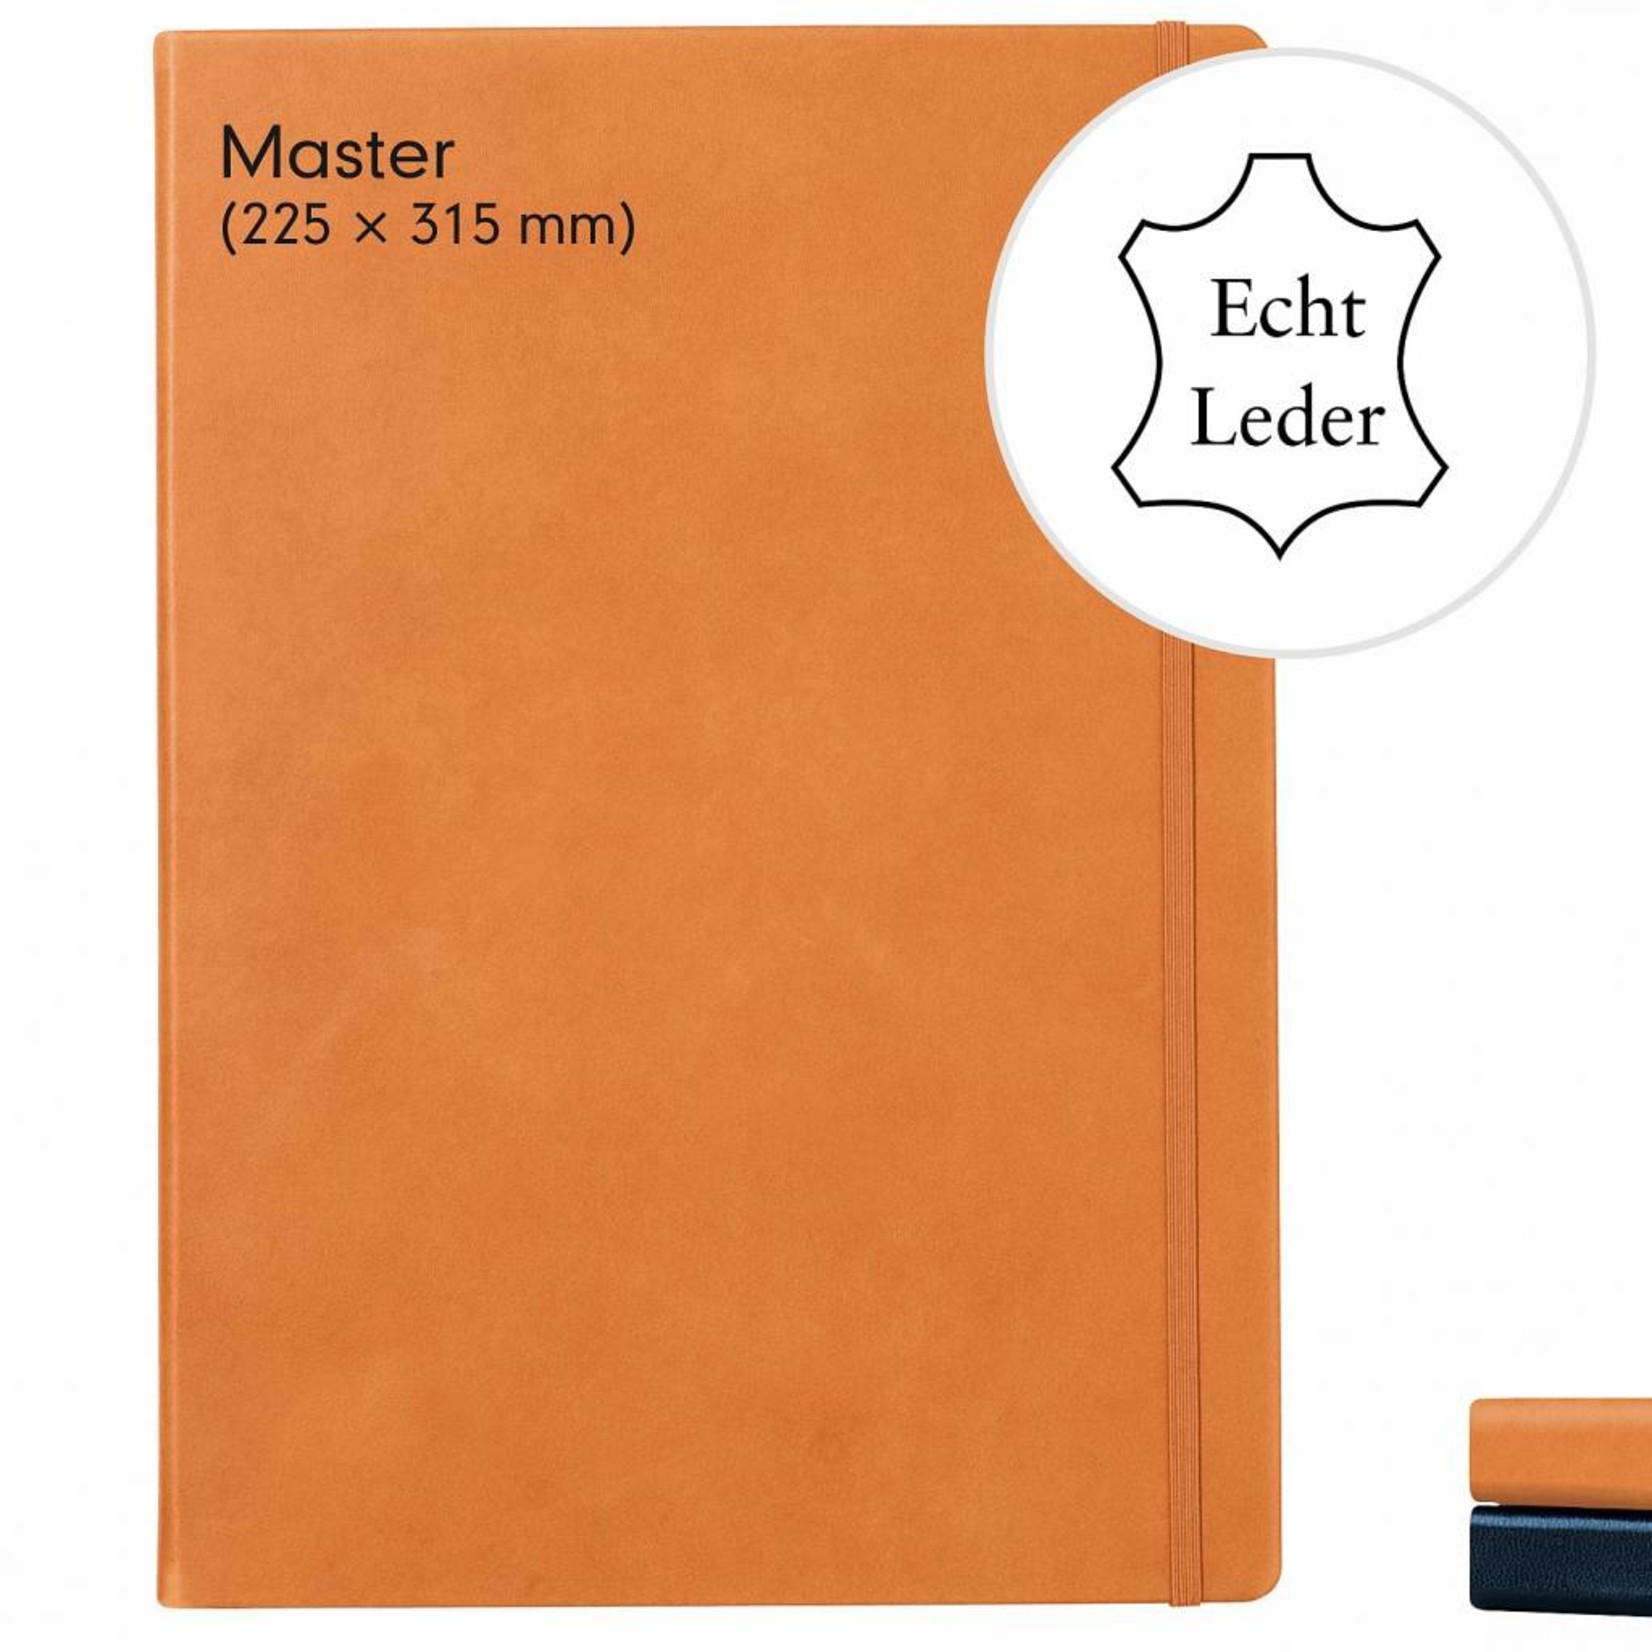 Leuchtturm1917 LT Notizbuch A4 MASTER LEDER schwarz glatt